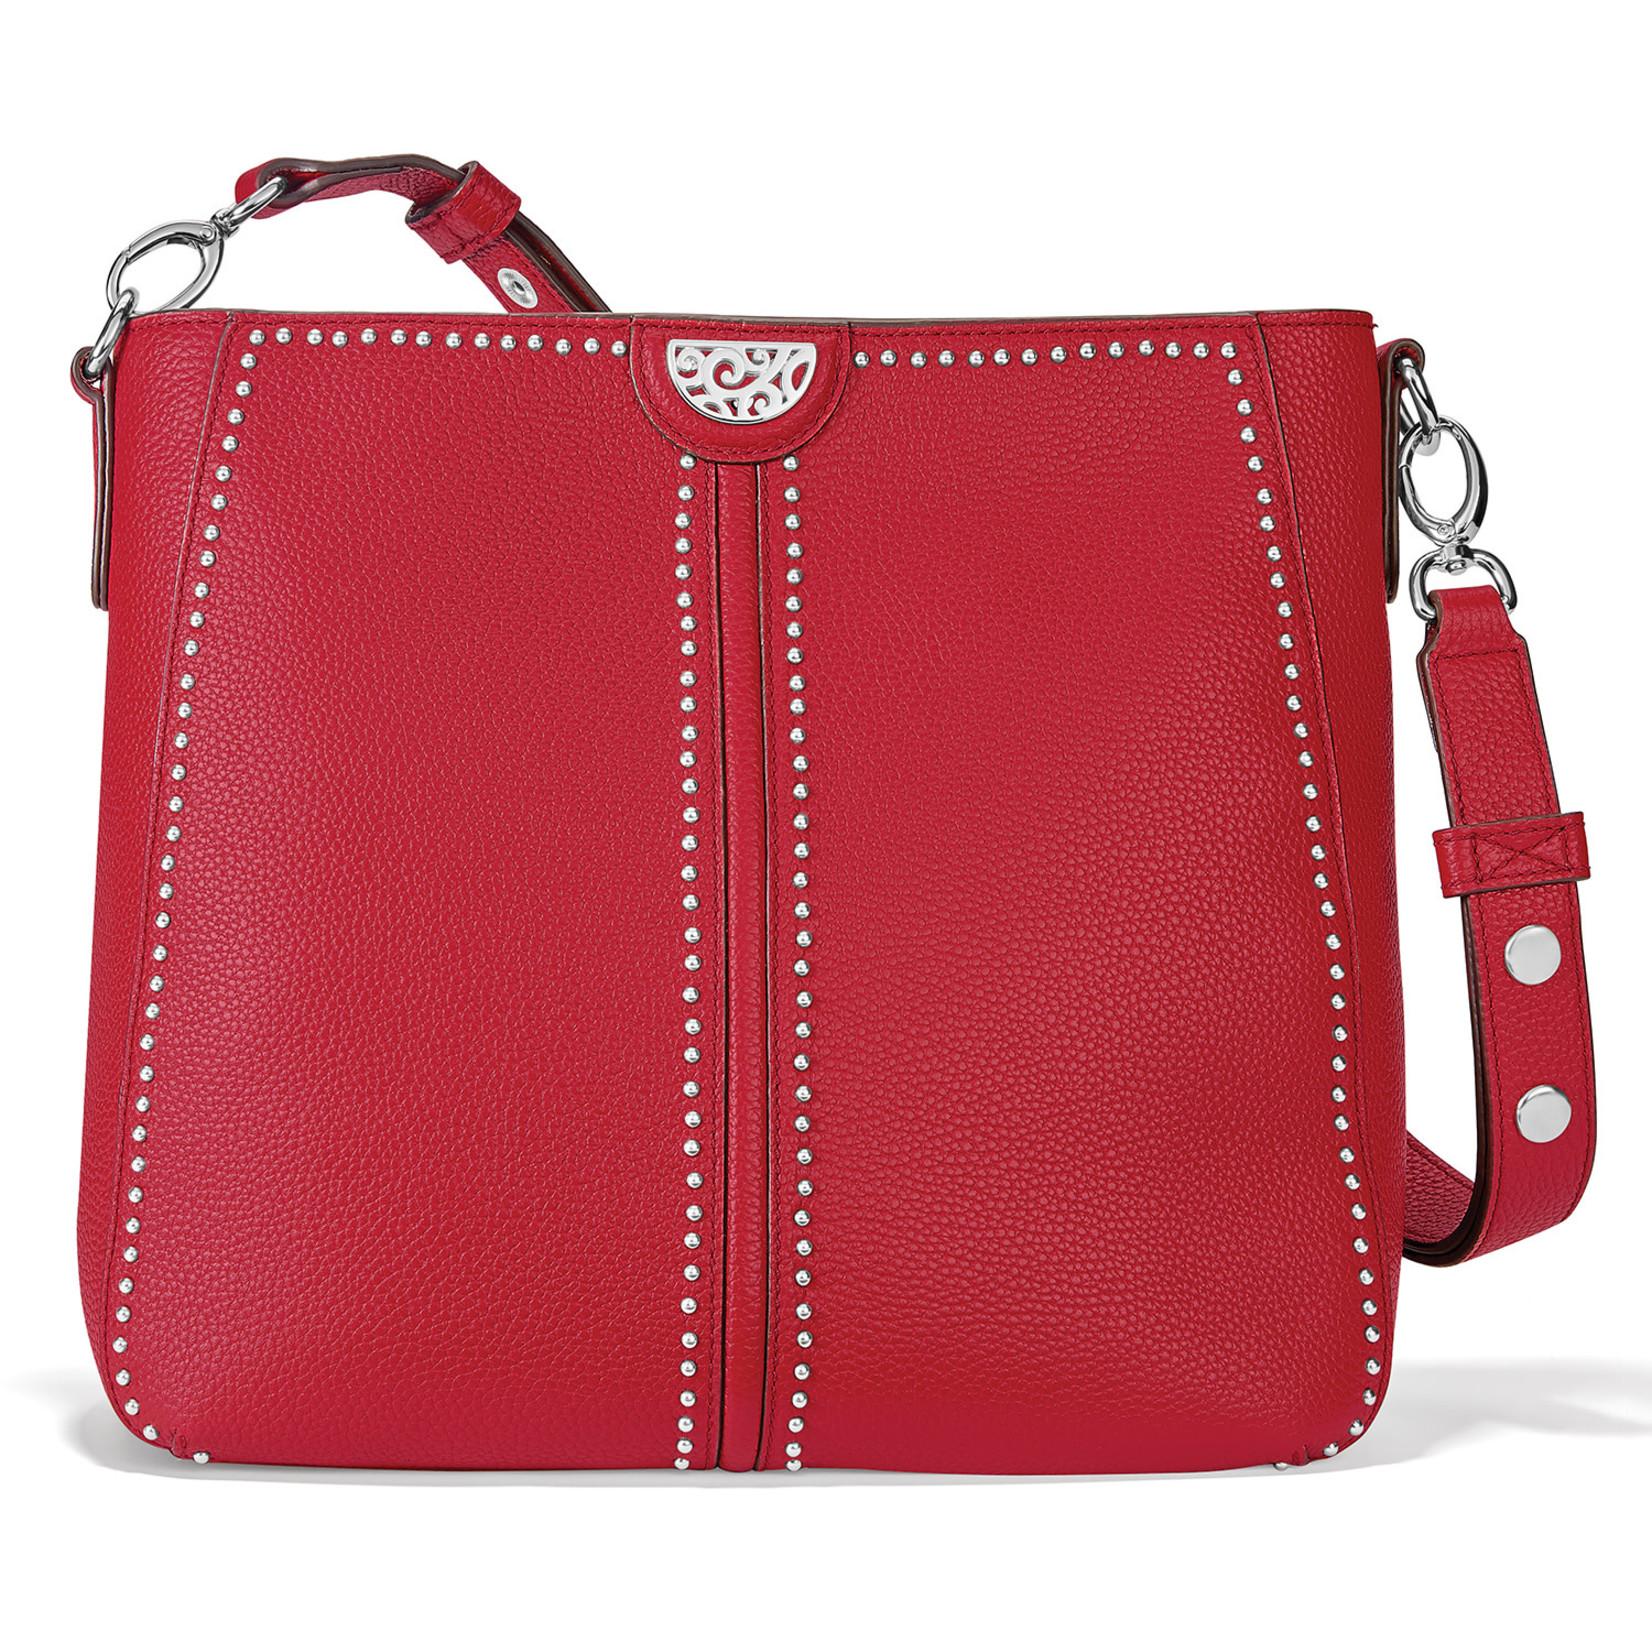 Brighton Nikki Convertible Shoulder Bag in Lipstick